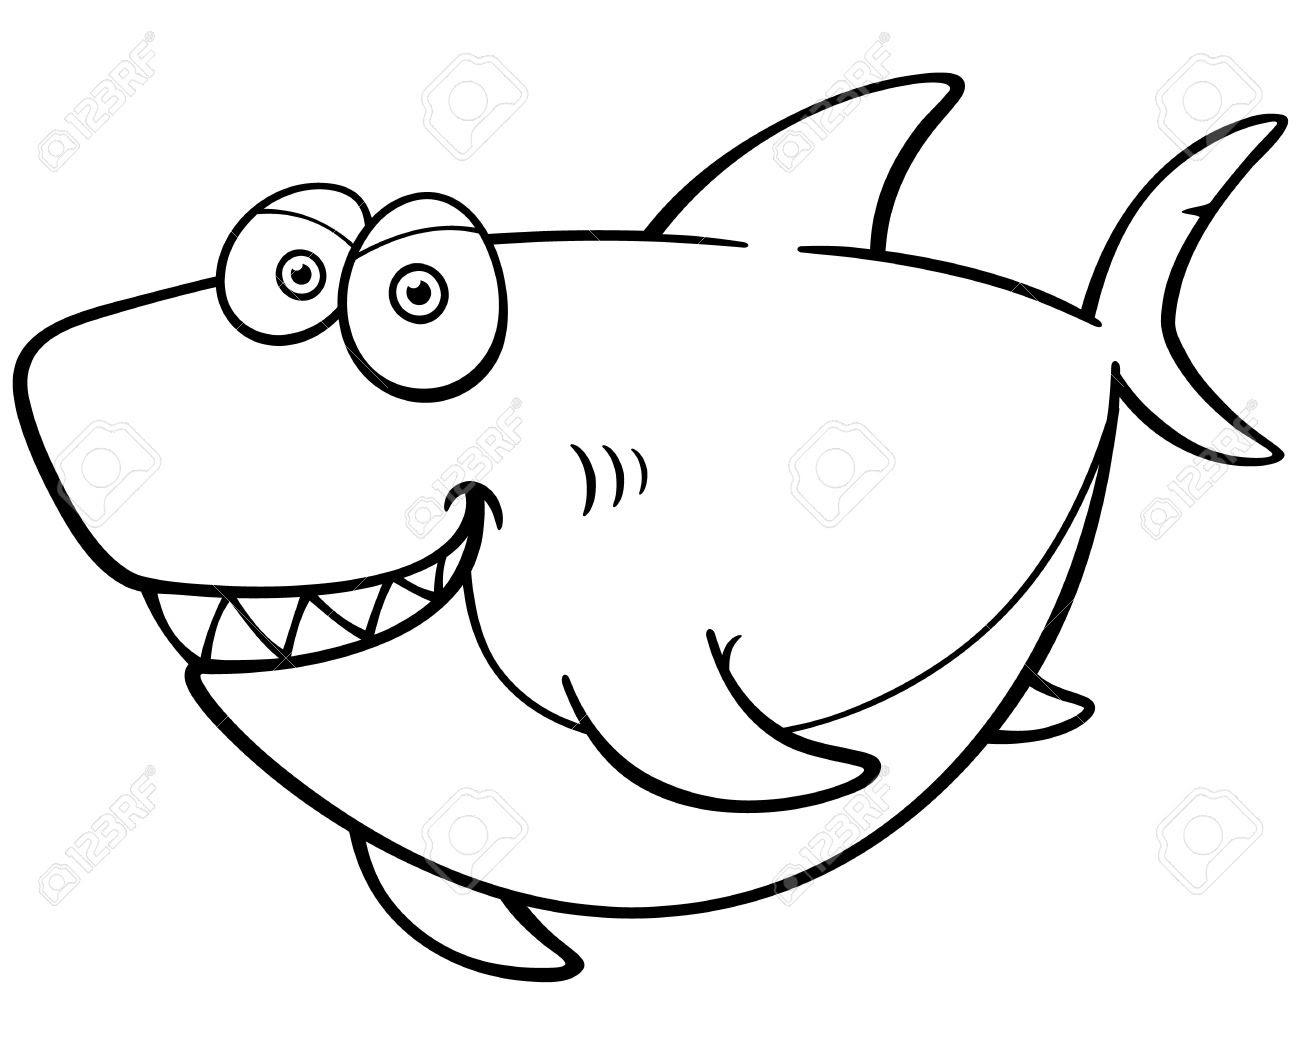 Shark Simple Drawing at GetDrawings | Free download